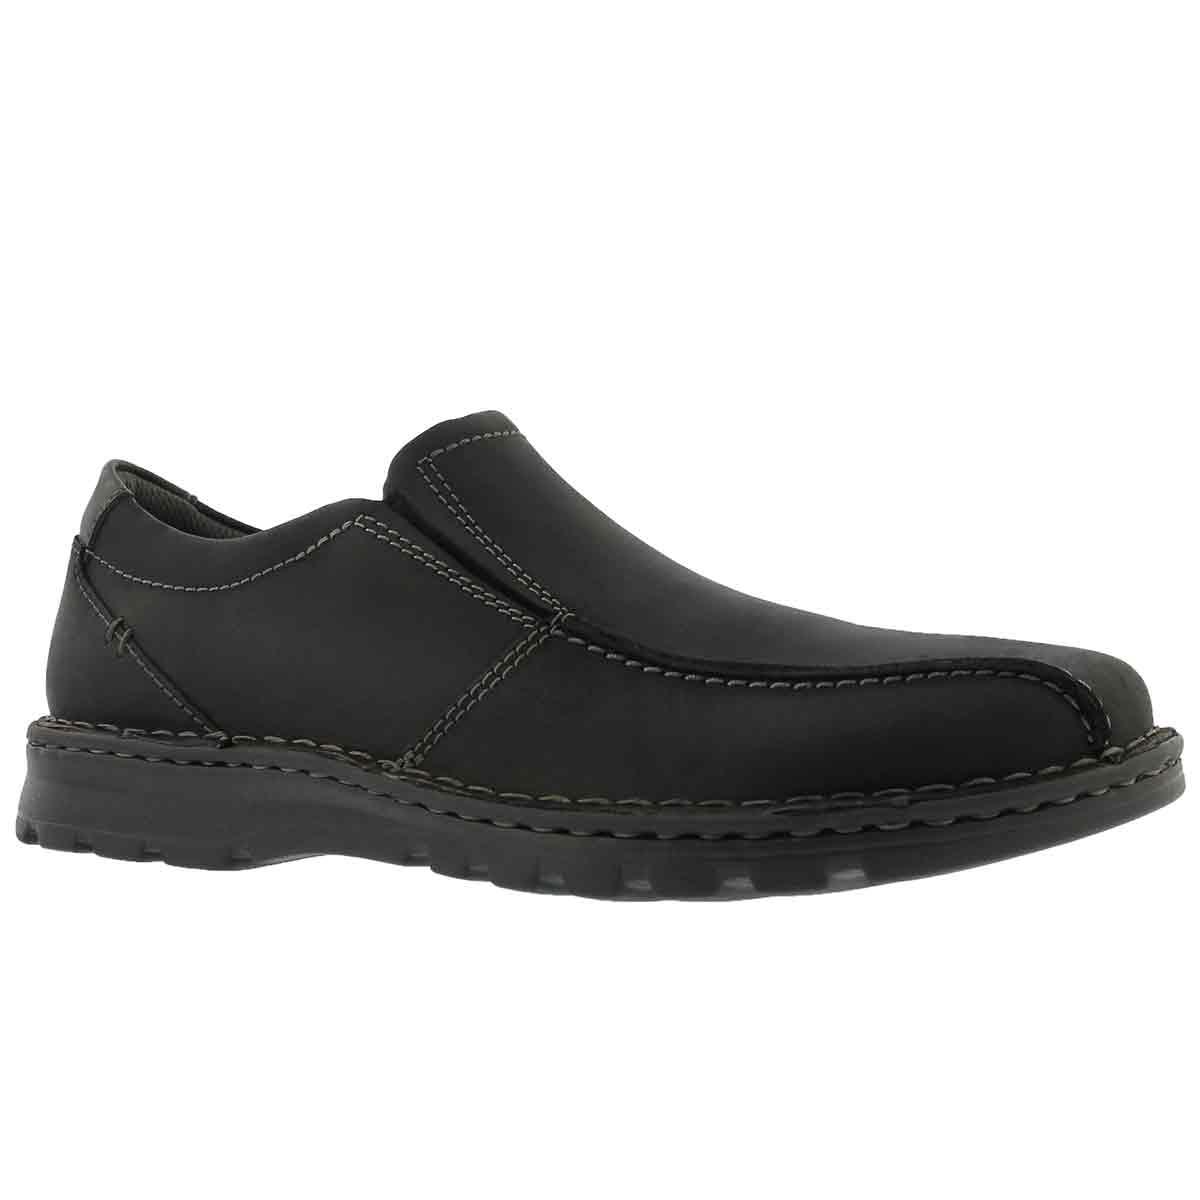 Men's VANEK STEP black casual slip ons